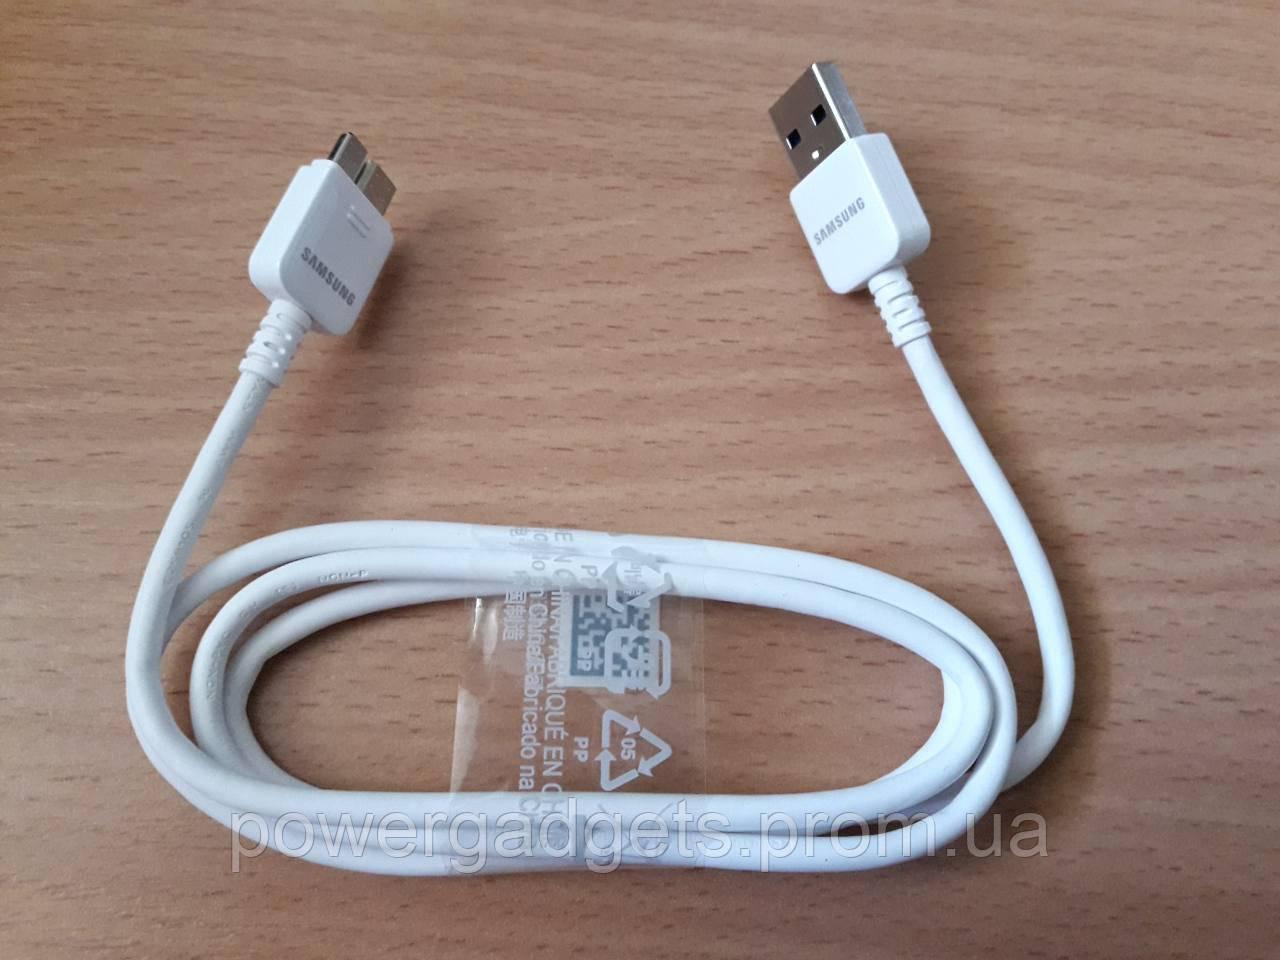 Кабель Samsung micro USB 3.0 Galaxy Note 3, S5 оригинал